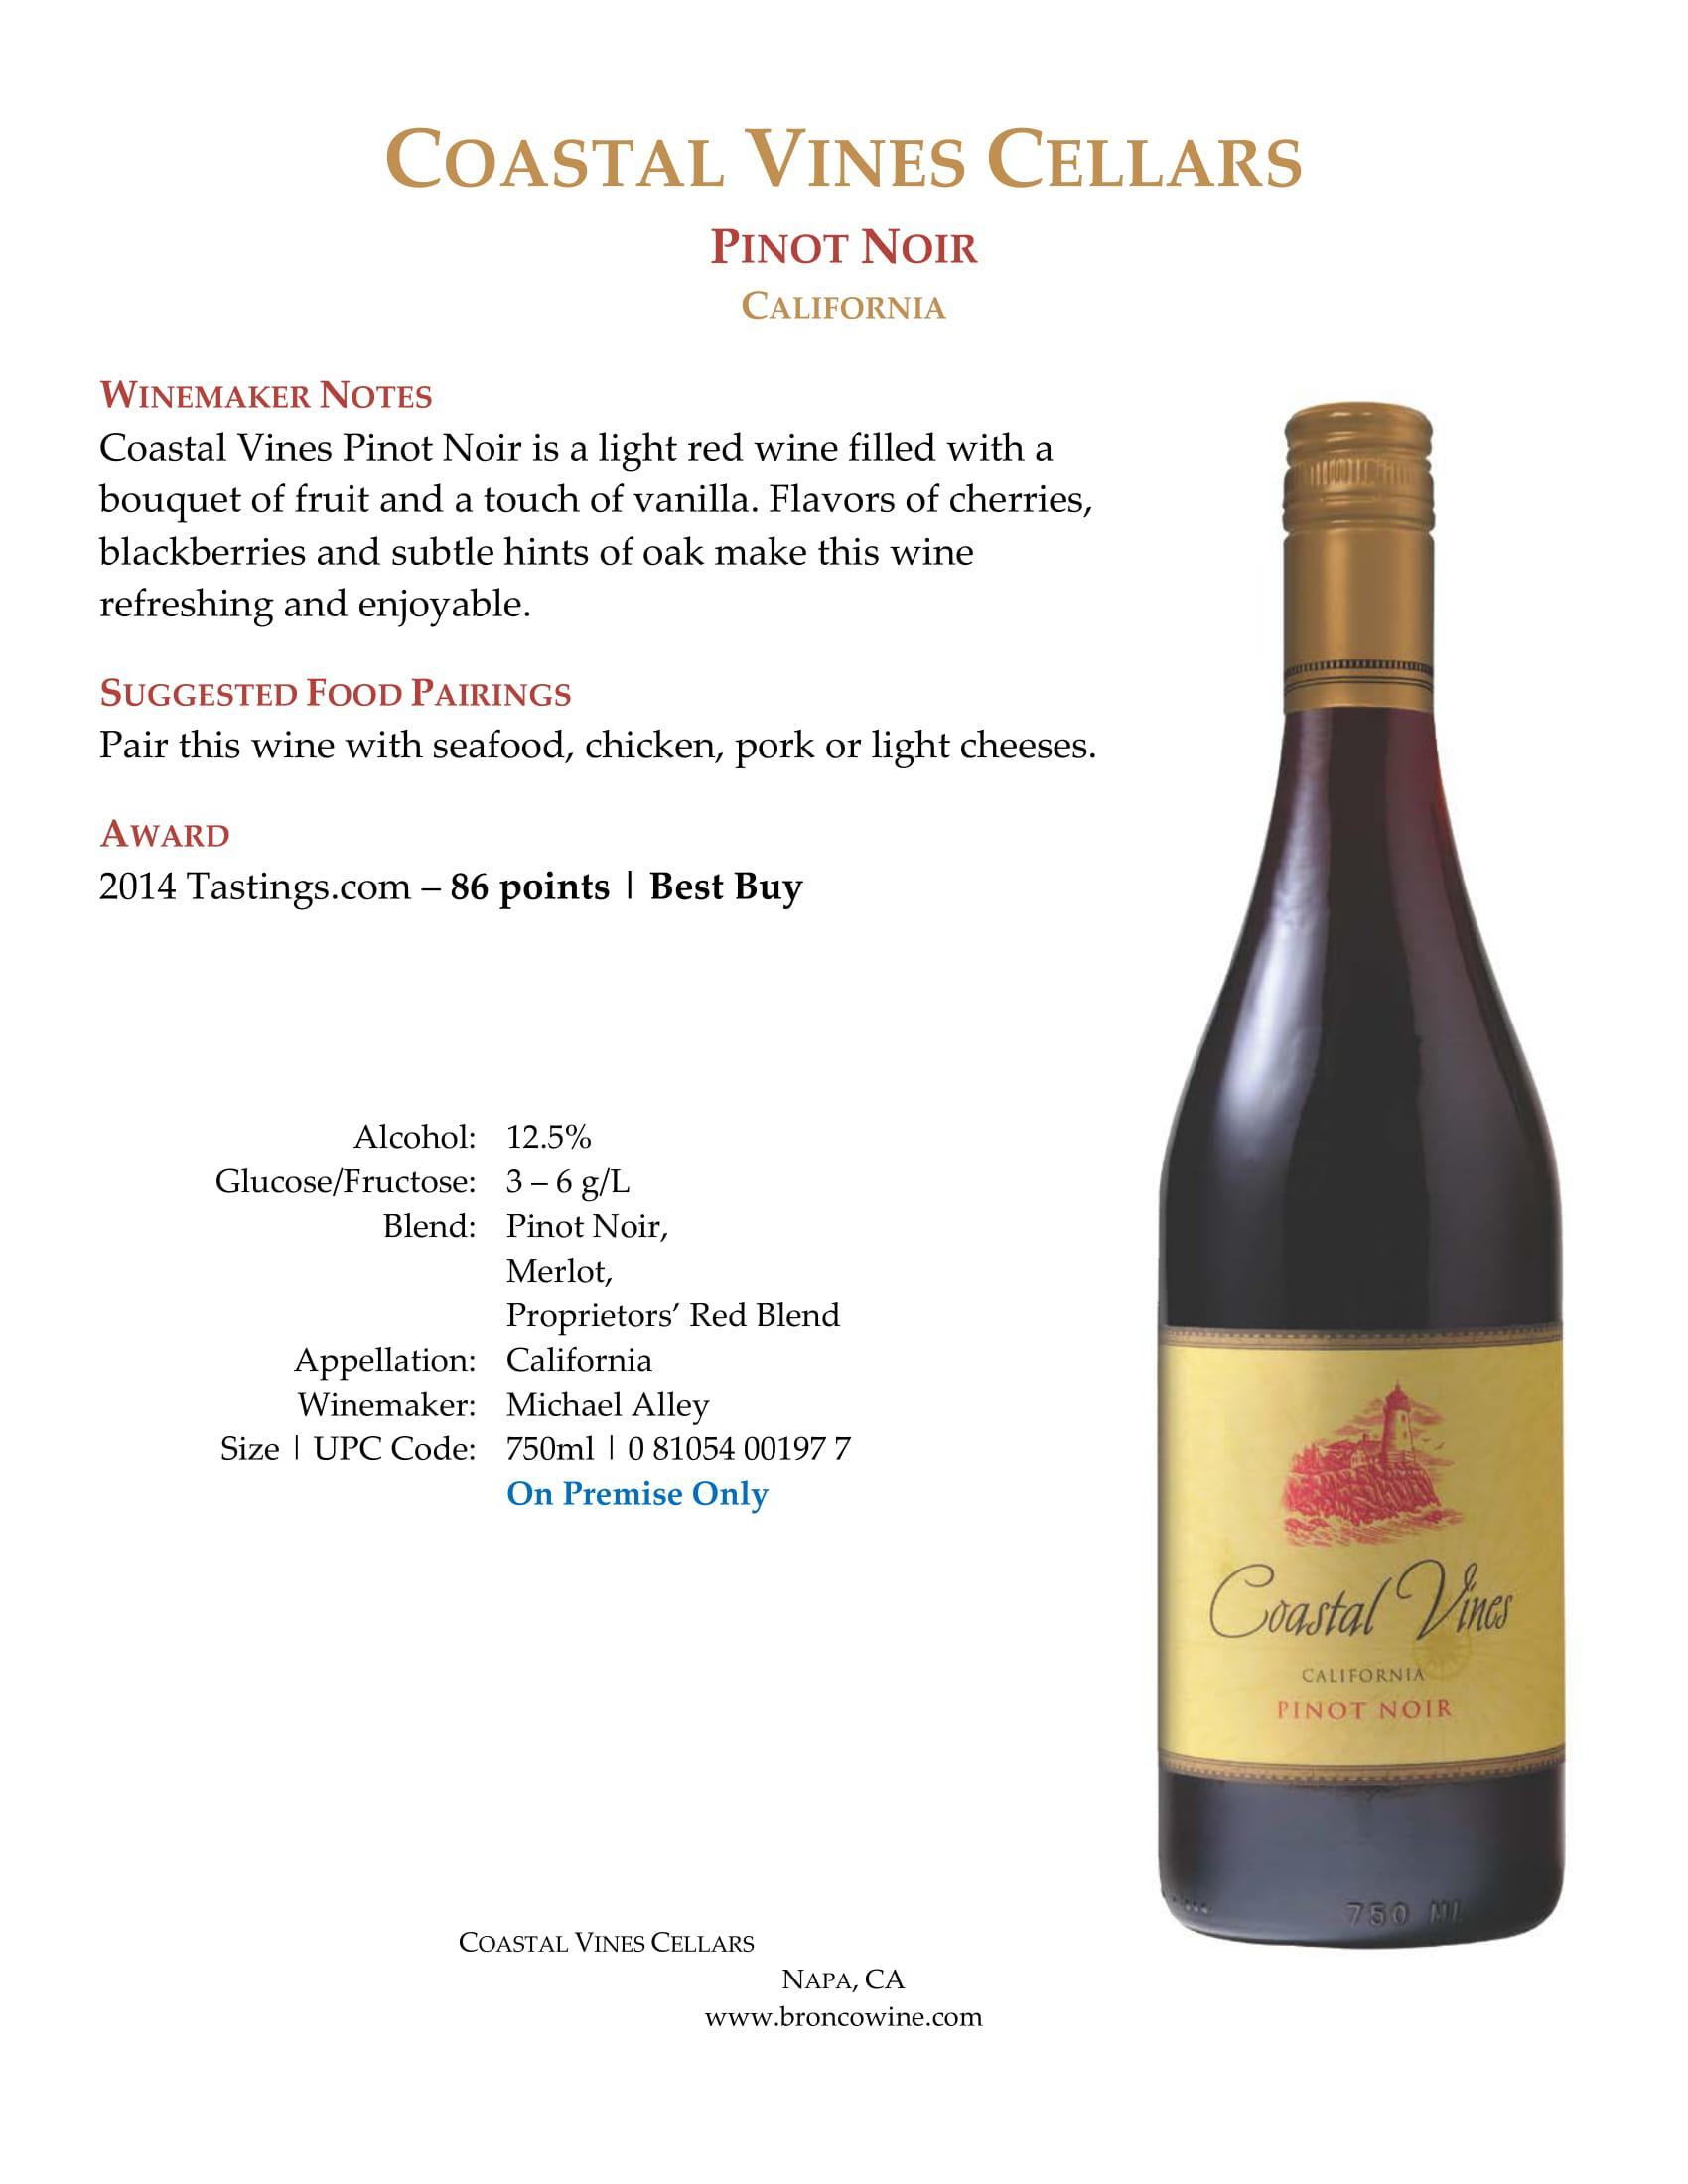 Coastal Vines Pinot Noir Sell Sheet